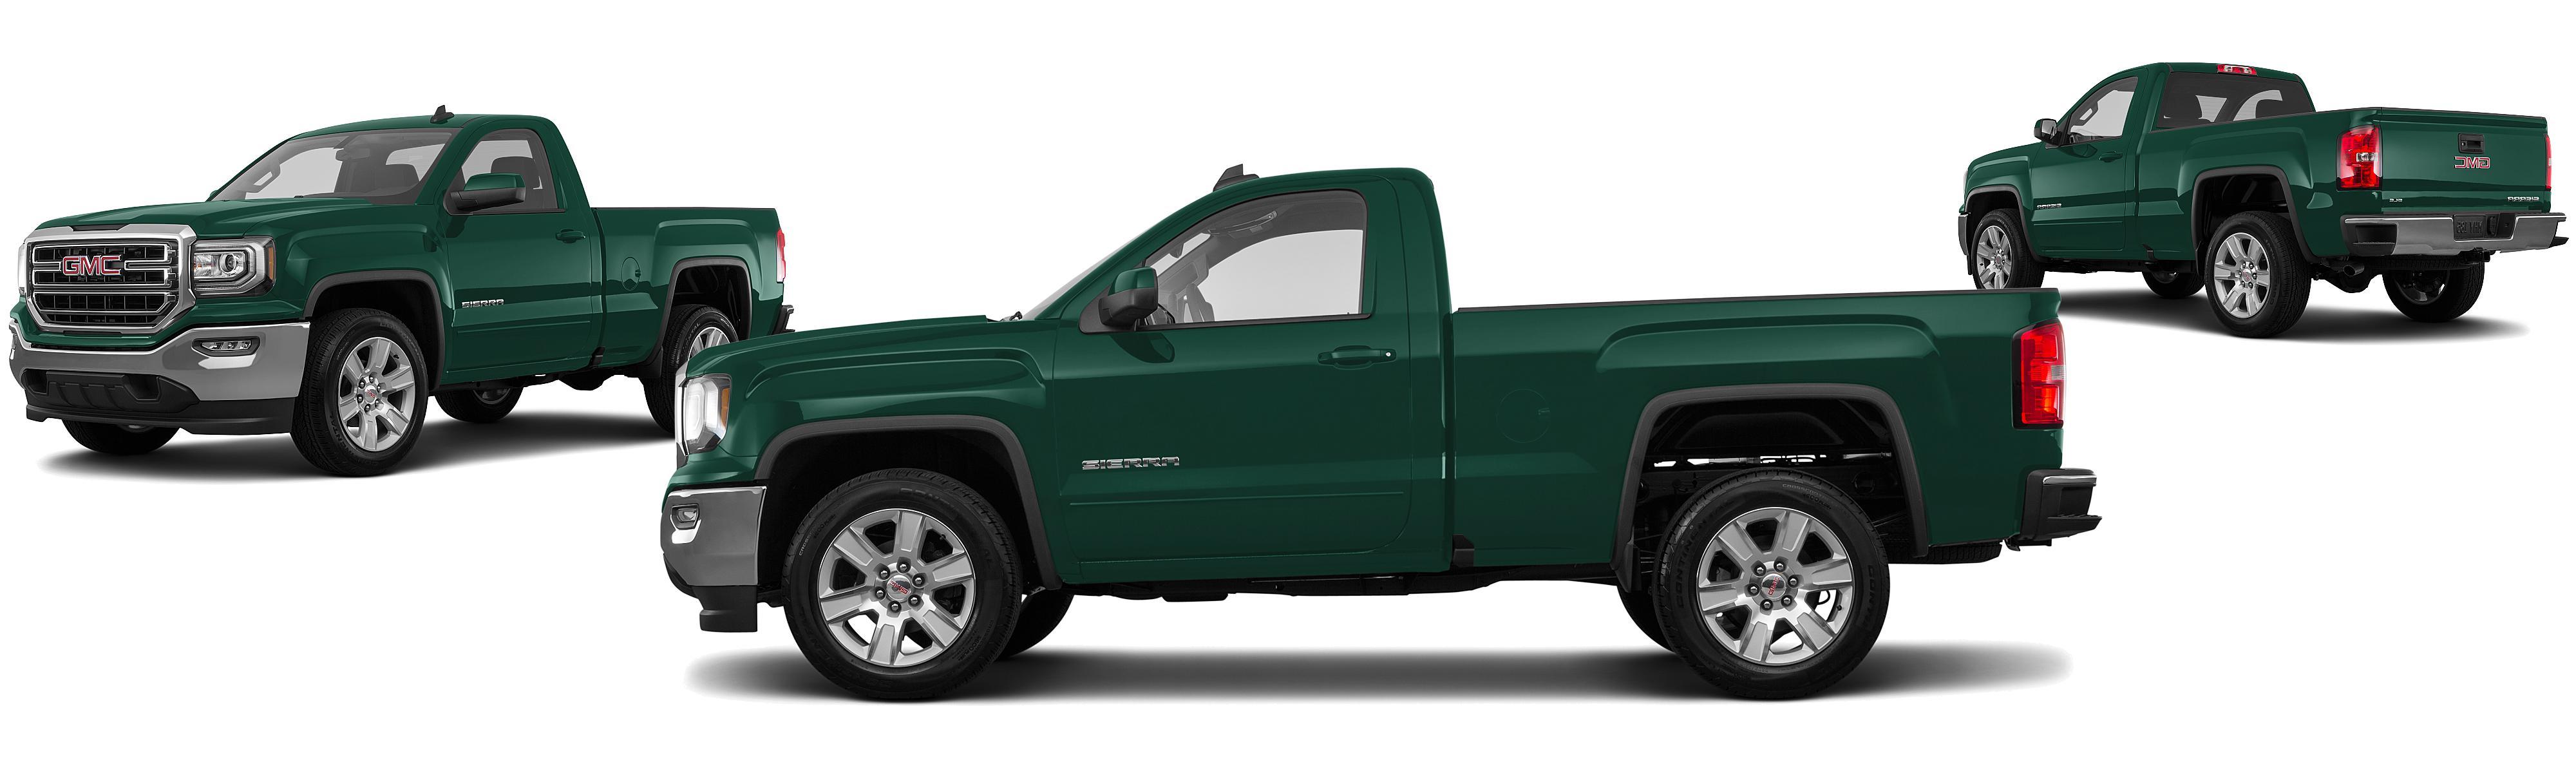 2017 gmc sierra 1500 4x2 sle 2dr regular cab 6 5 ft sb research groovecar